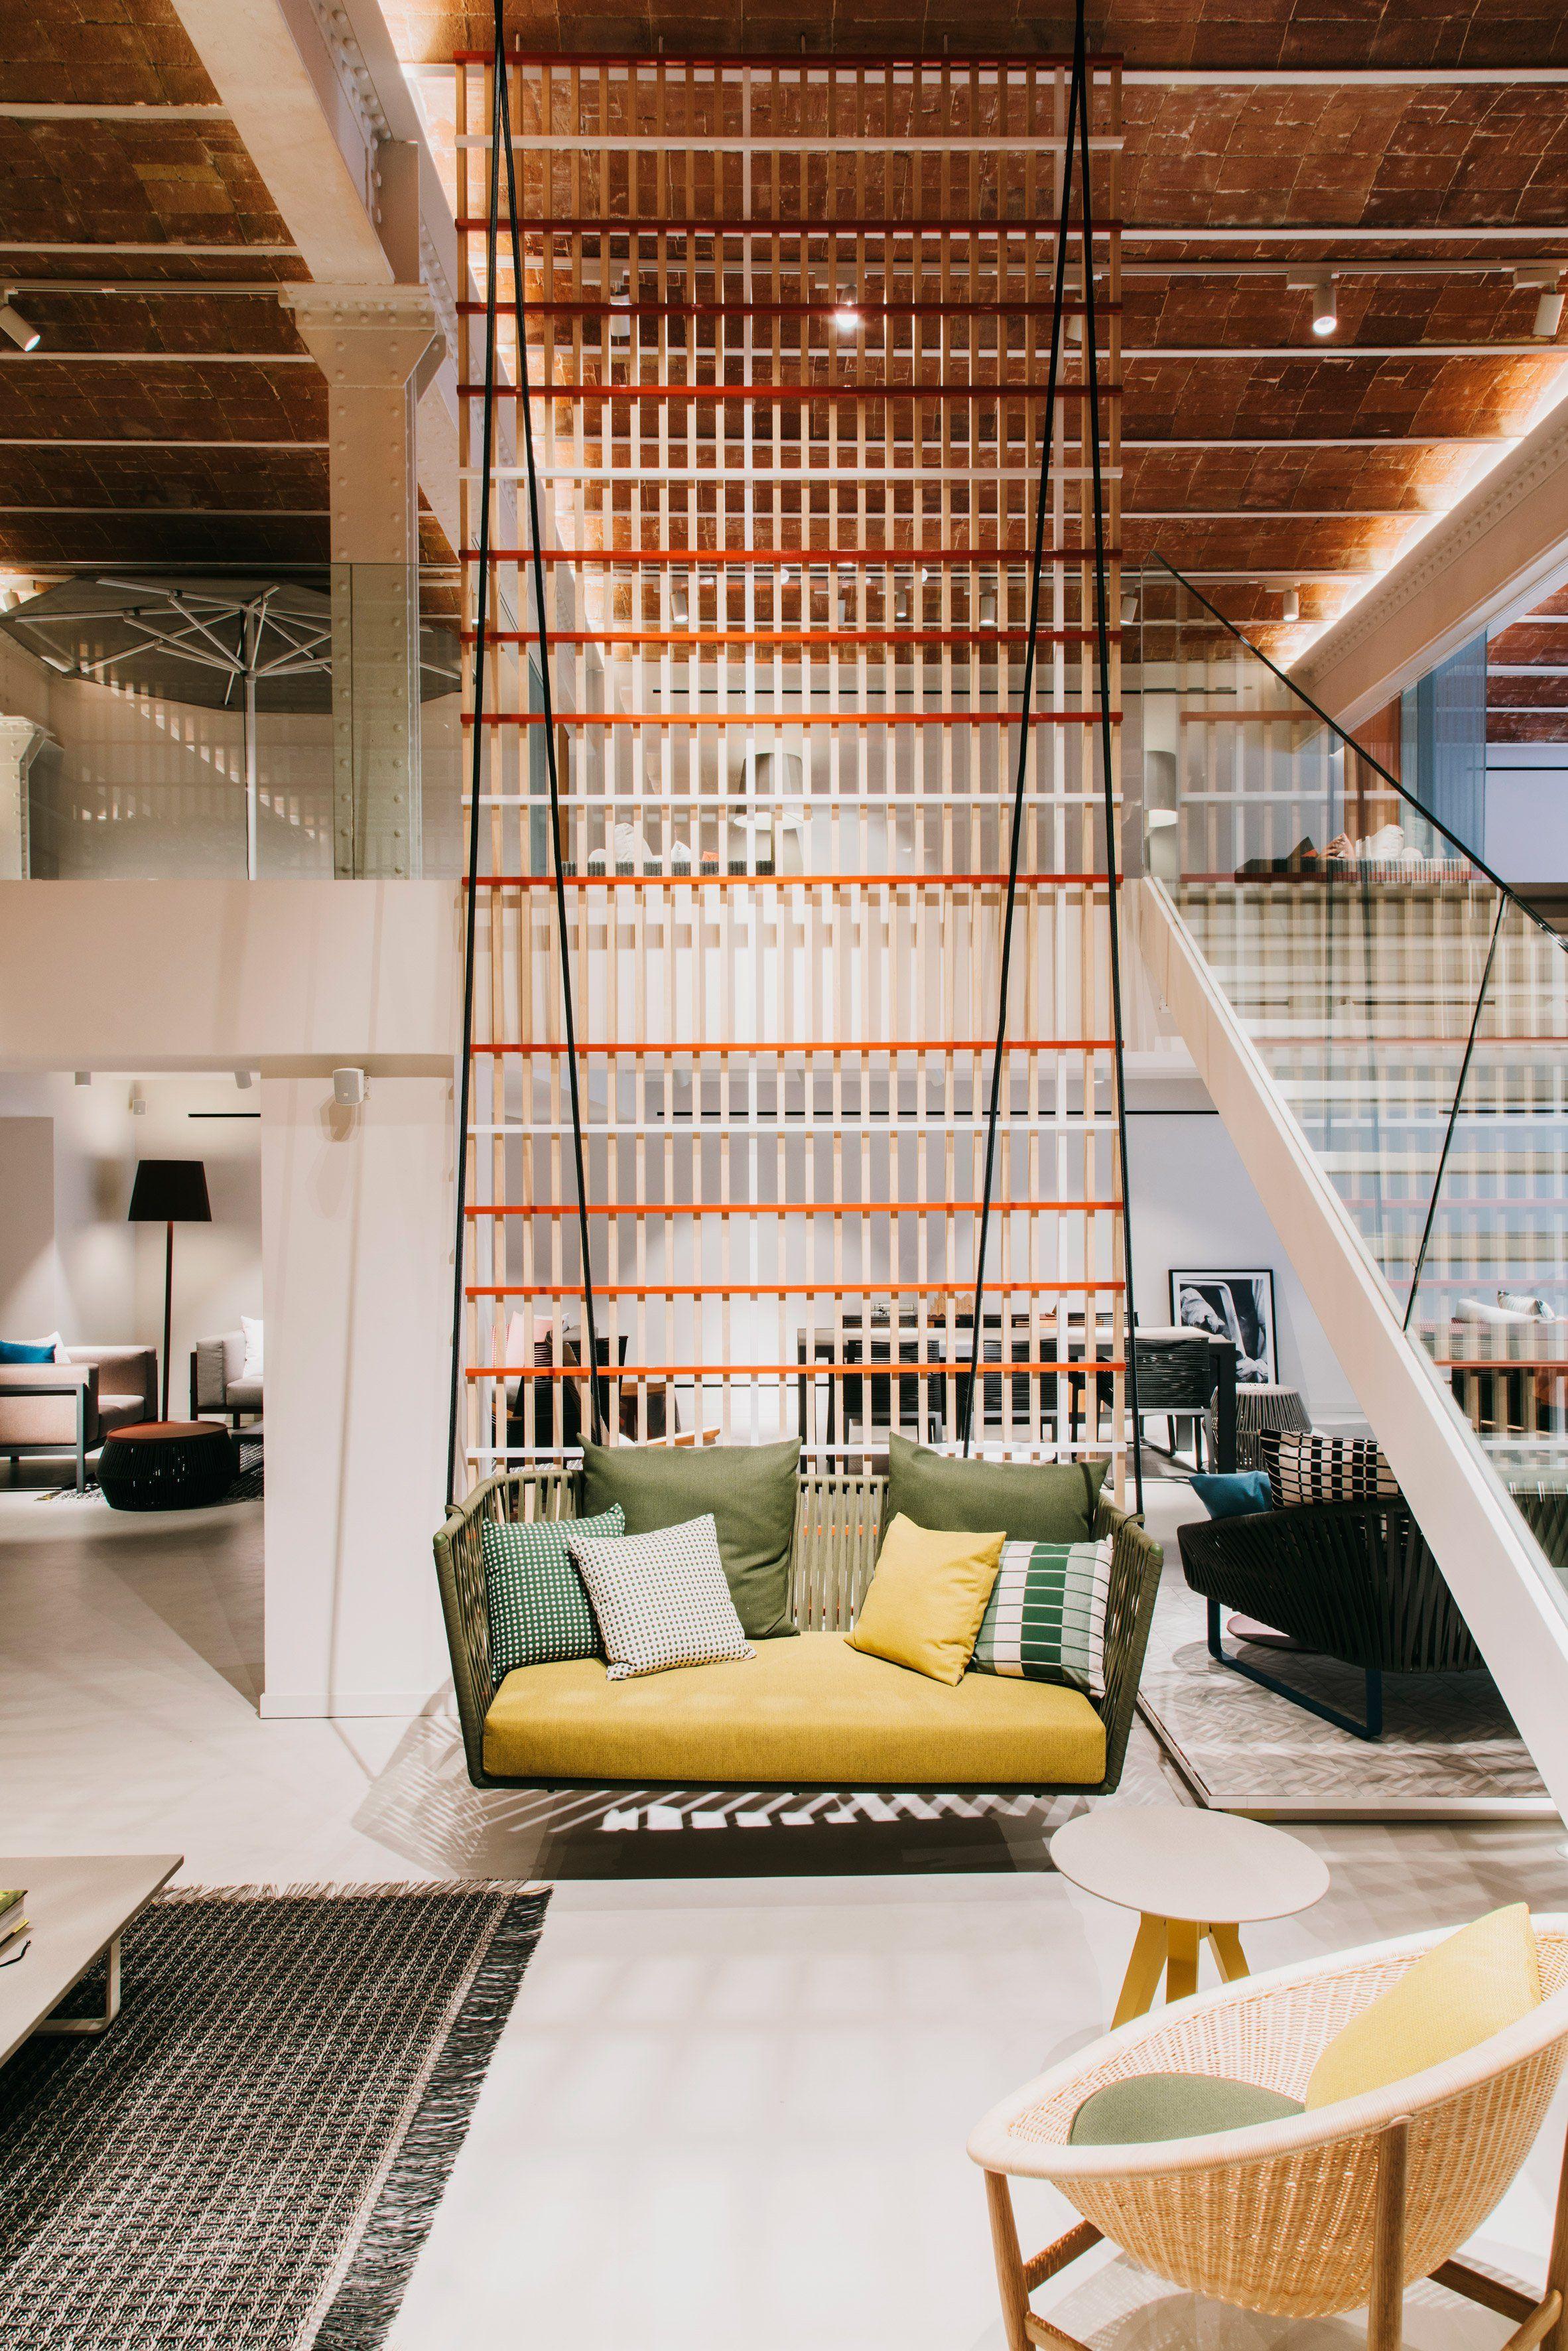 Patricia Urquiola has redesigned the Barcelona showroom of